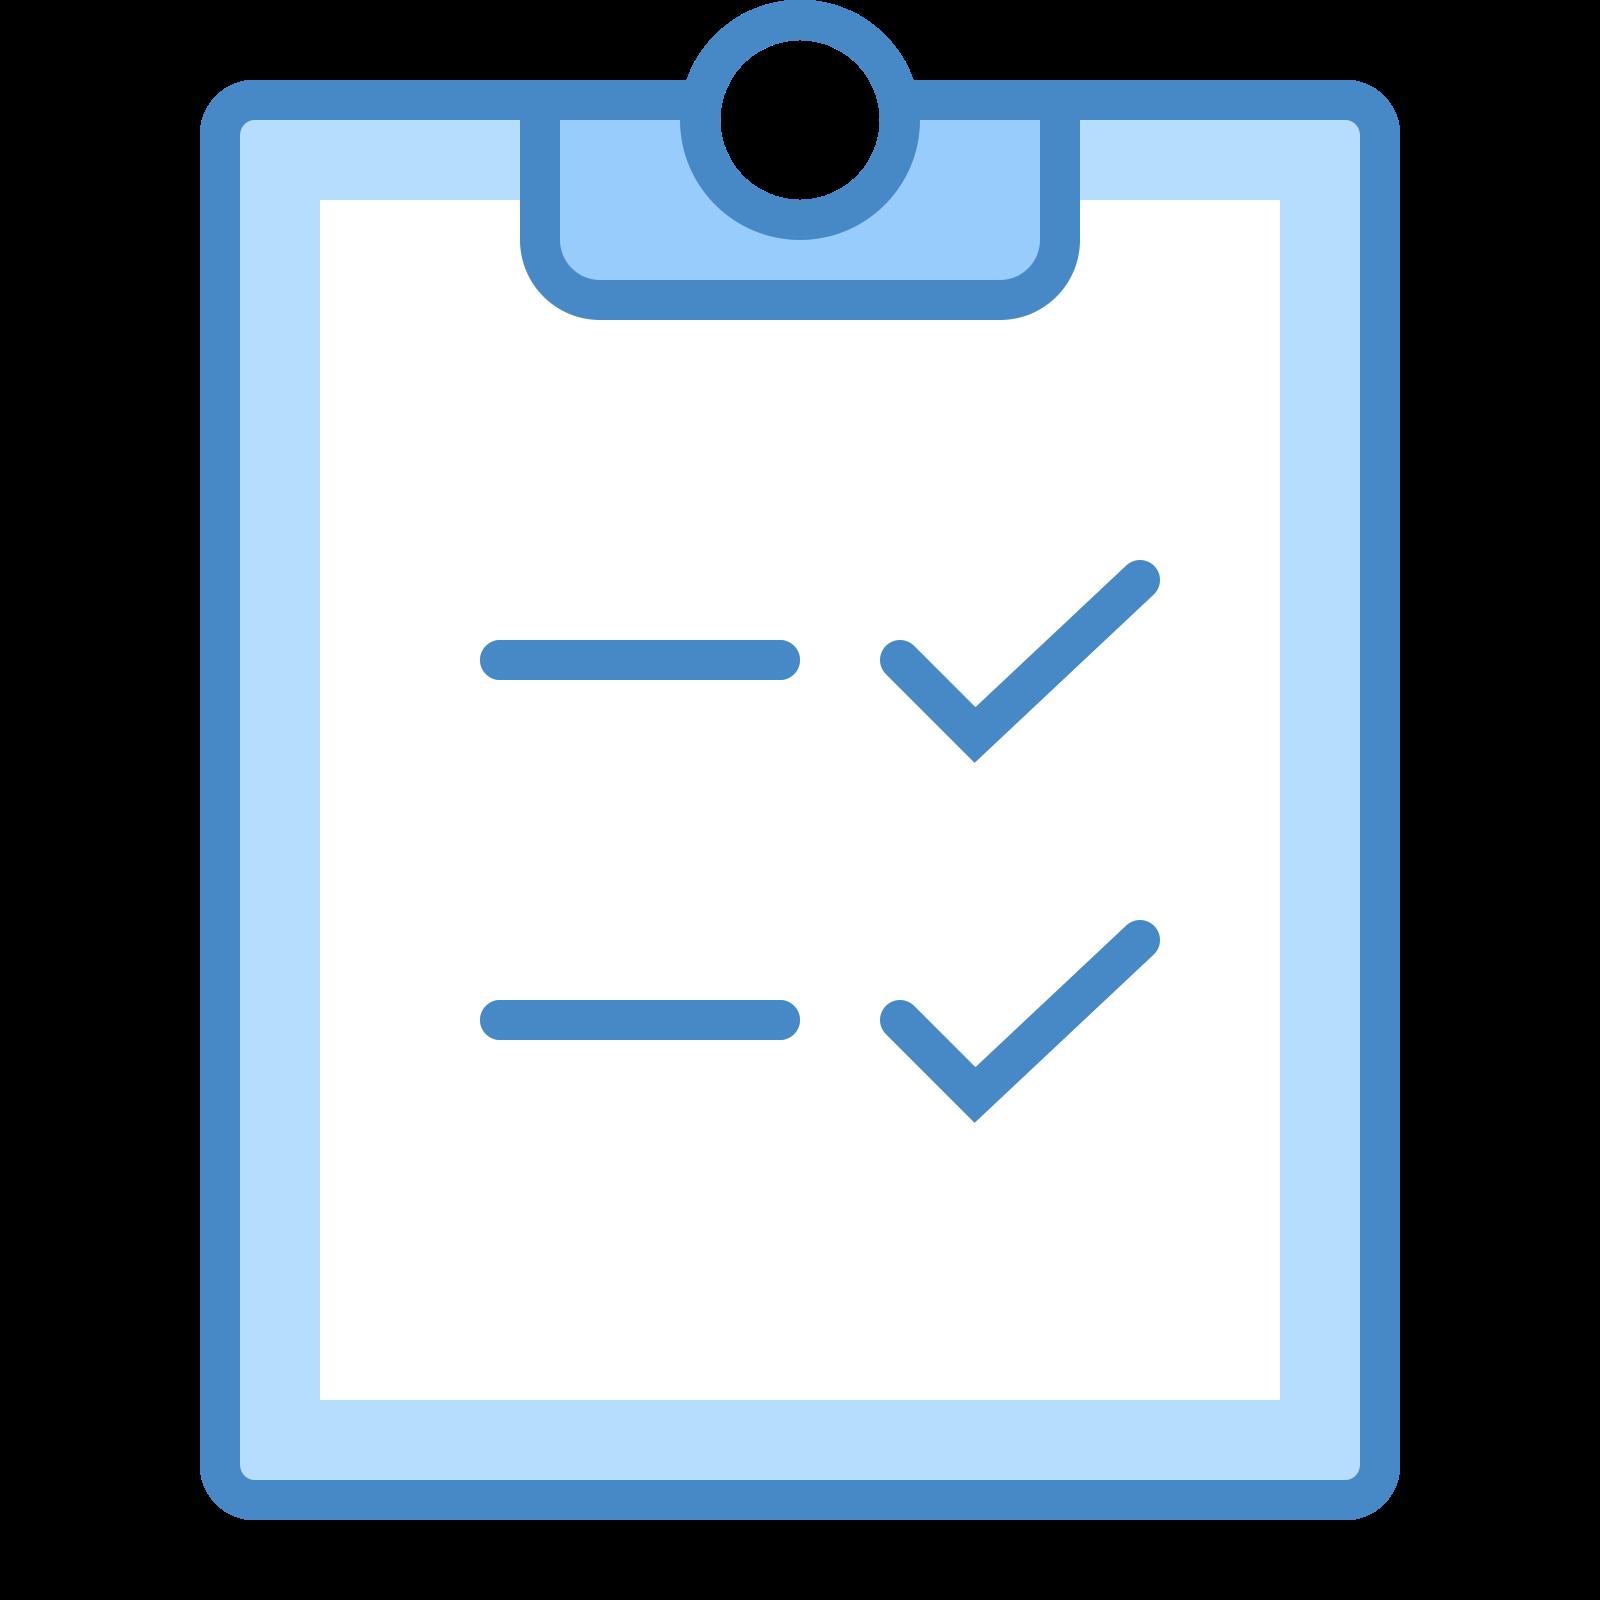 Test Passed icon